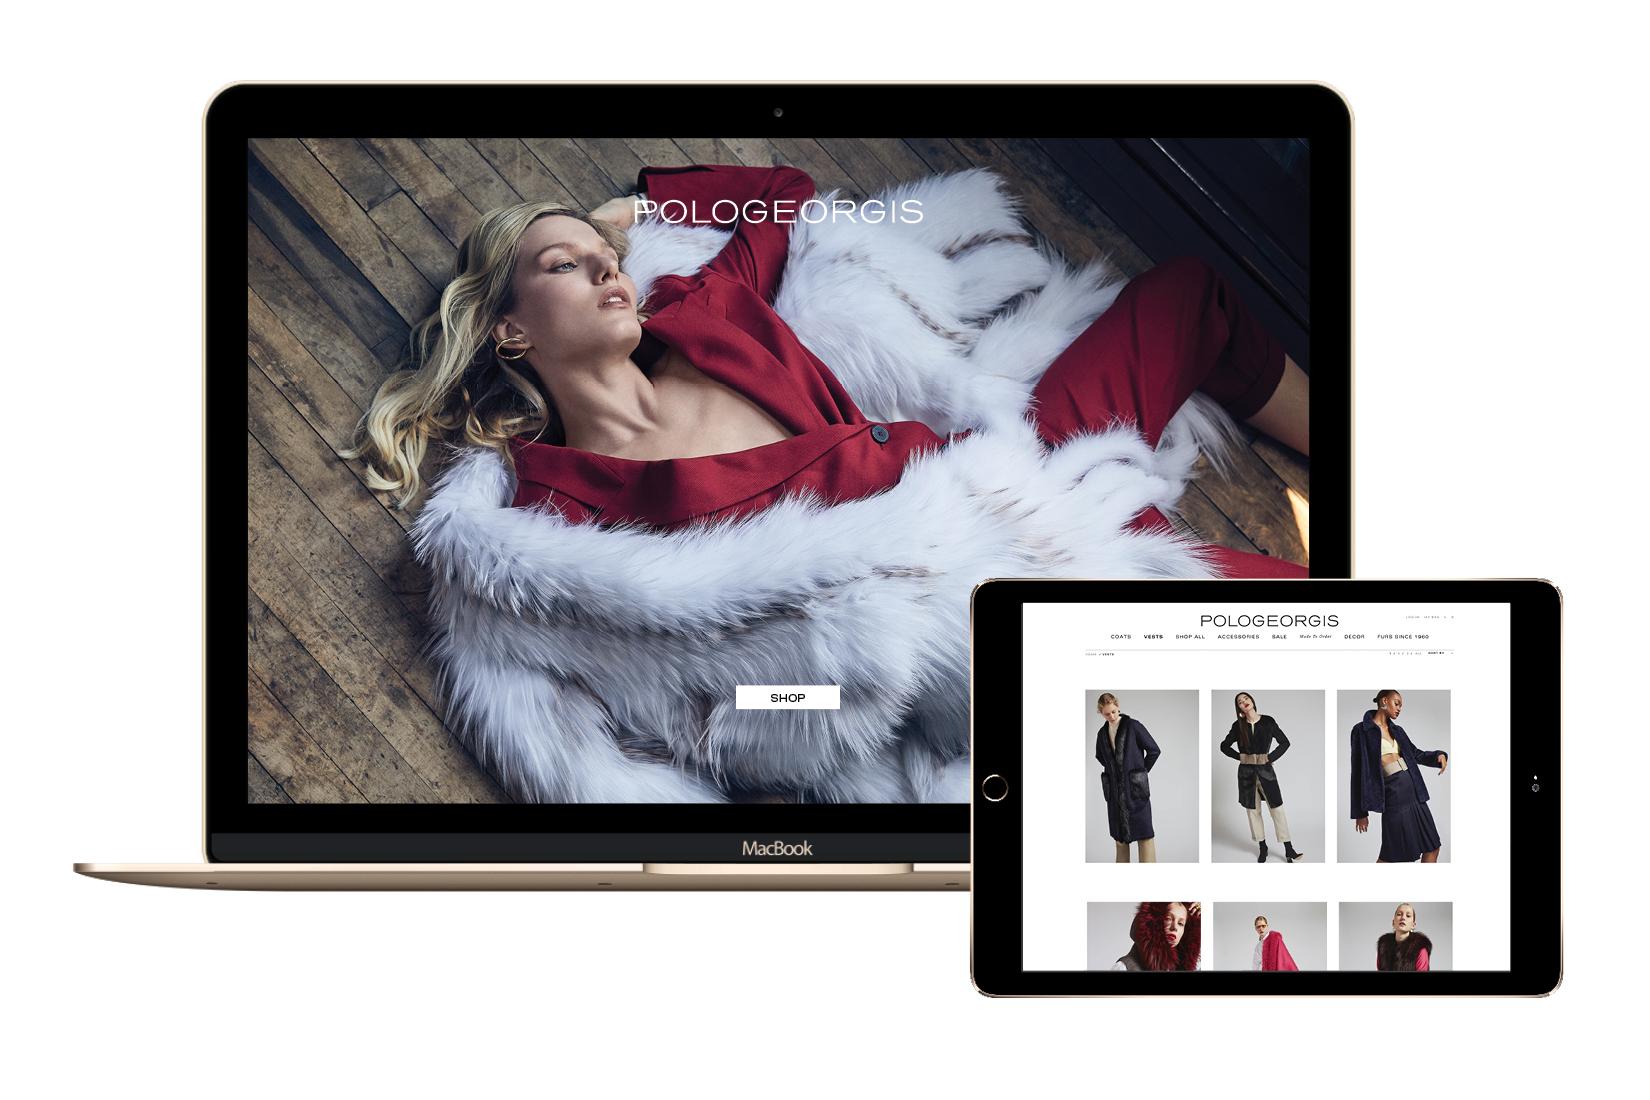 Model cast by DTE shot in Pologeorgis clothing for e-commerce platform.